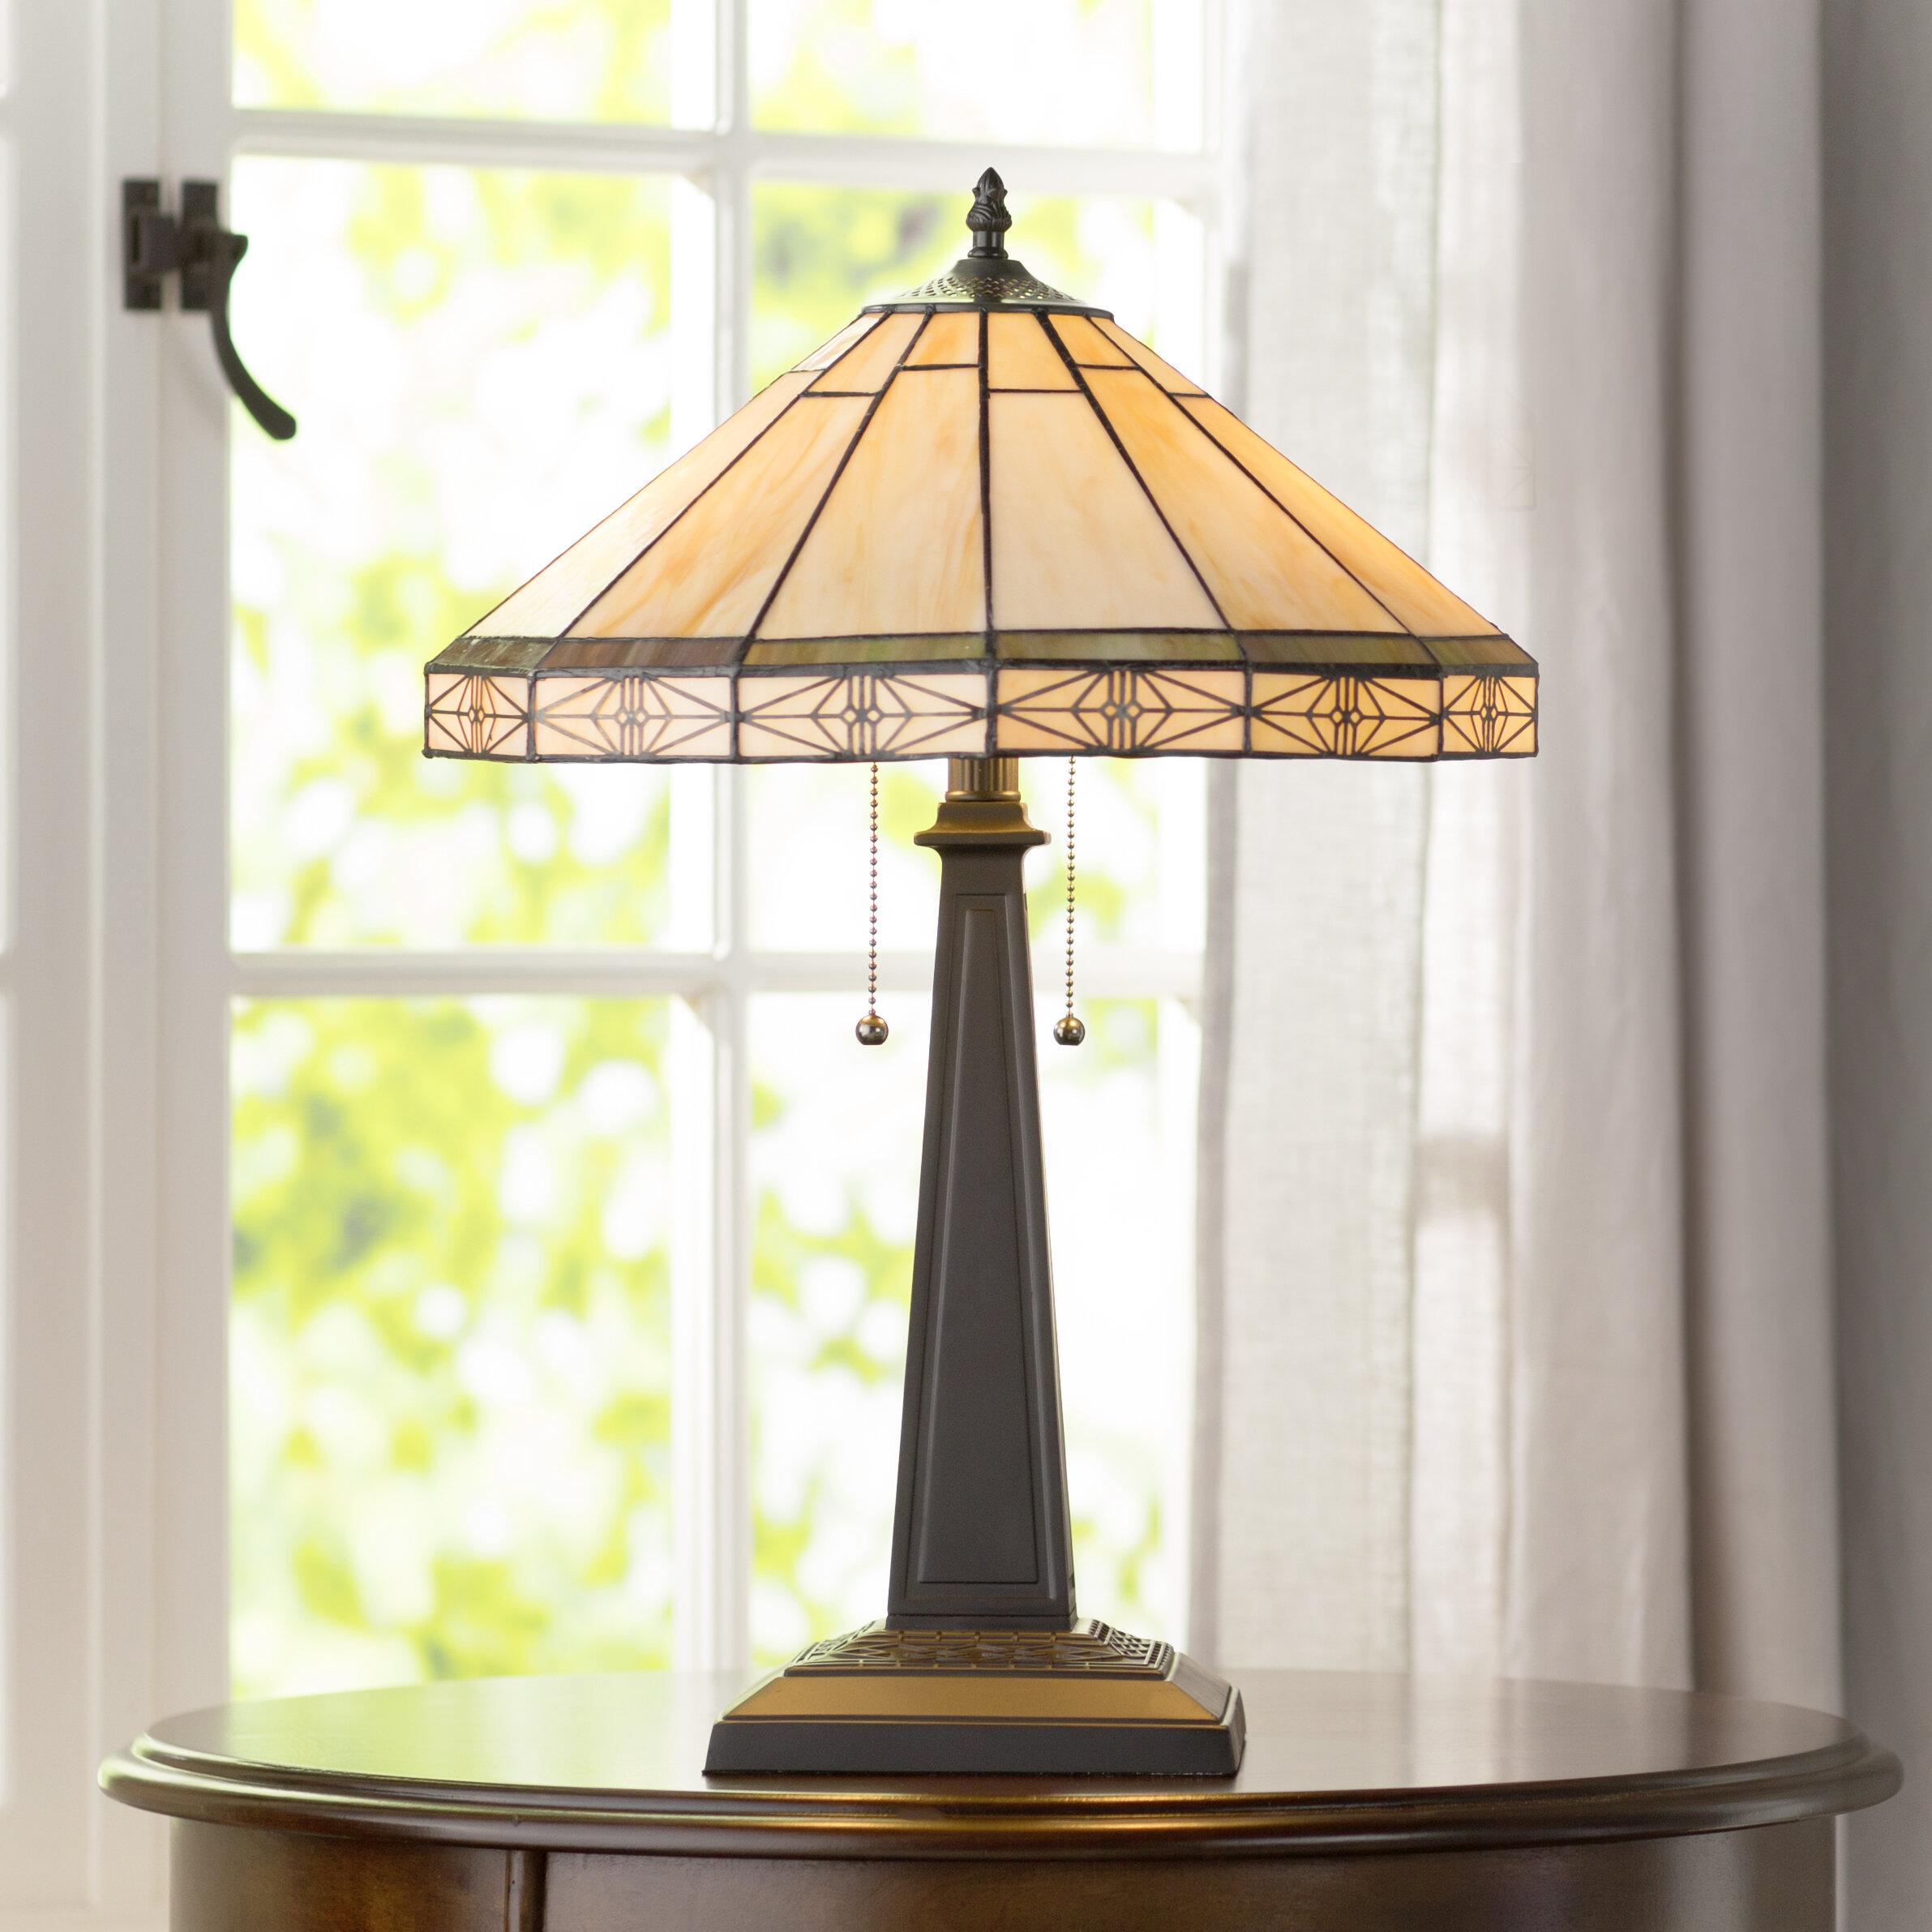 Astoria grand charlotte 22 6 table lamp reviews wayfair